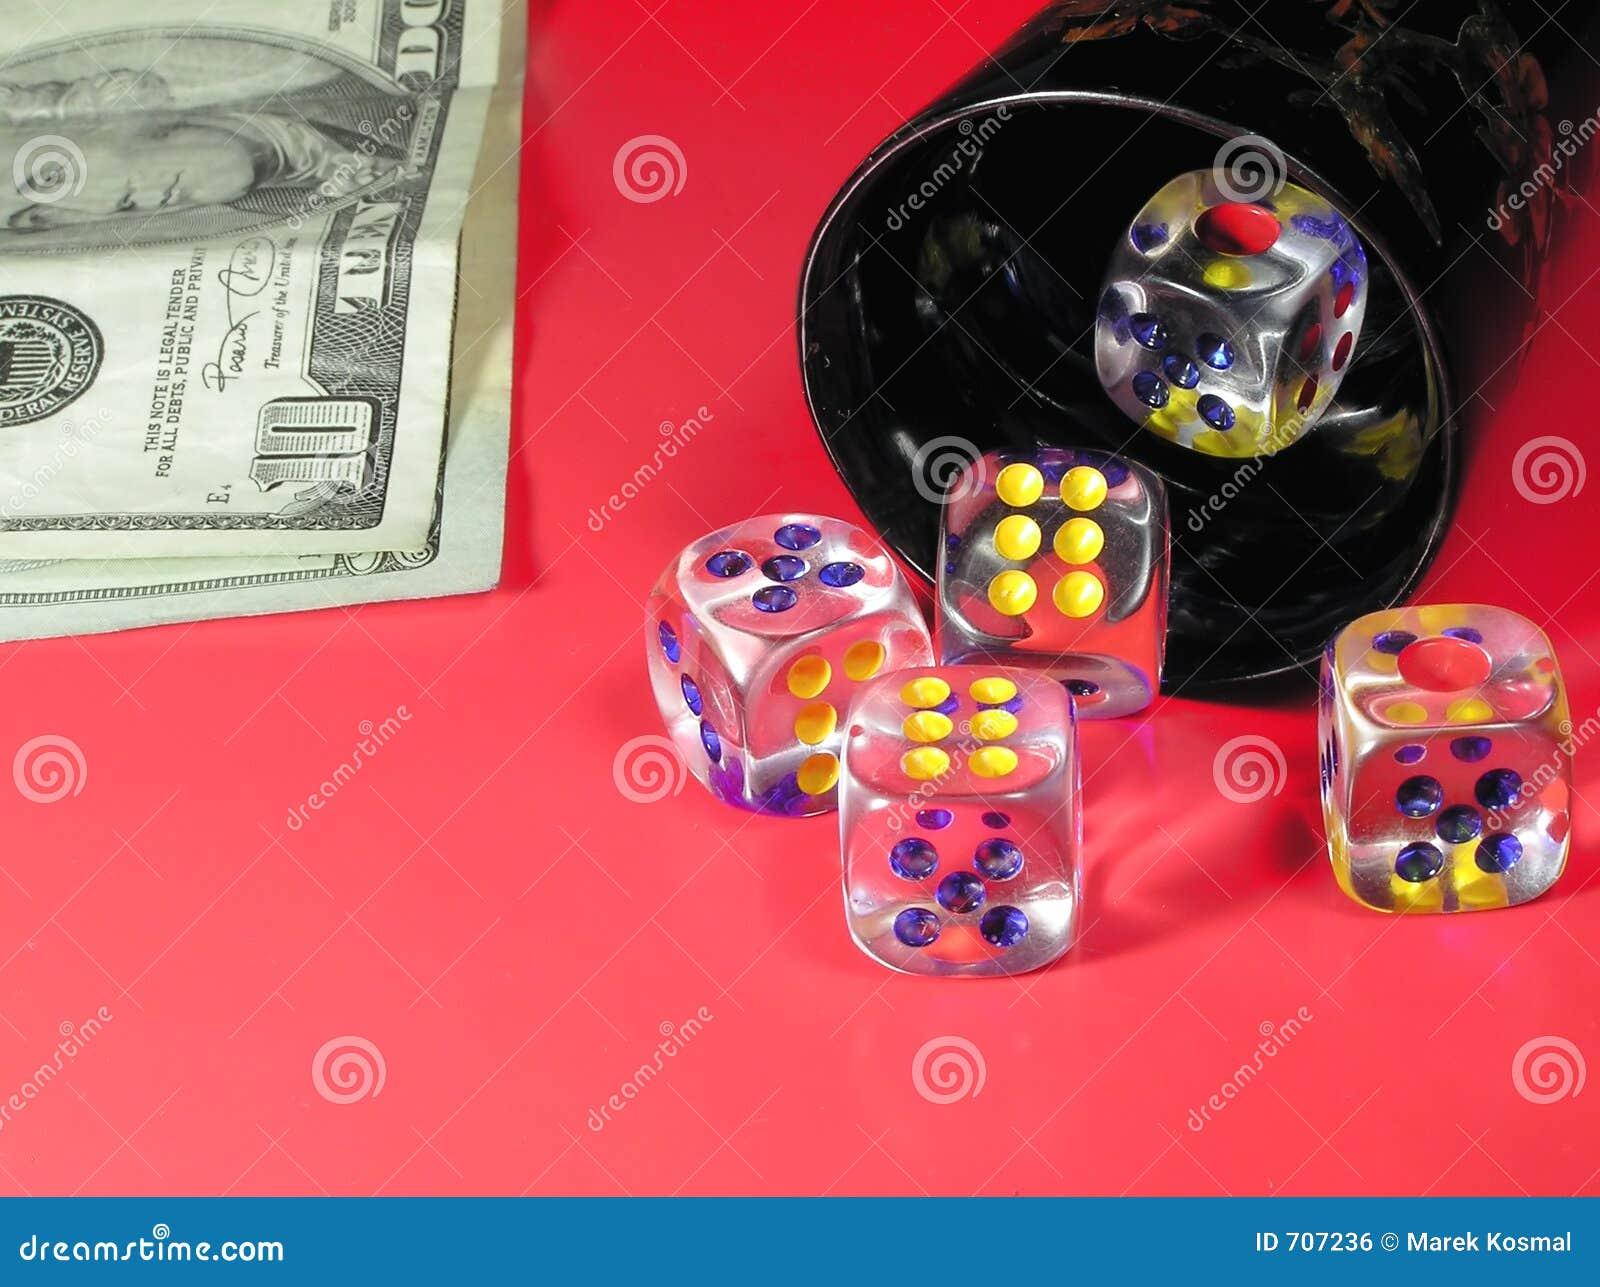 online slot casino casino holidays